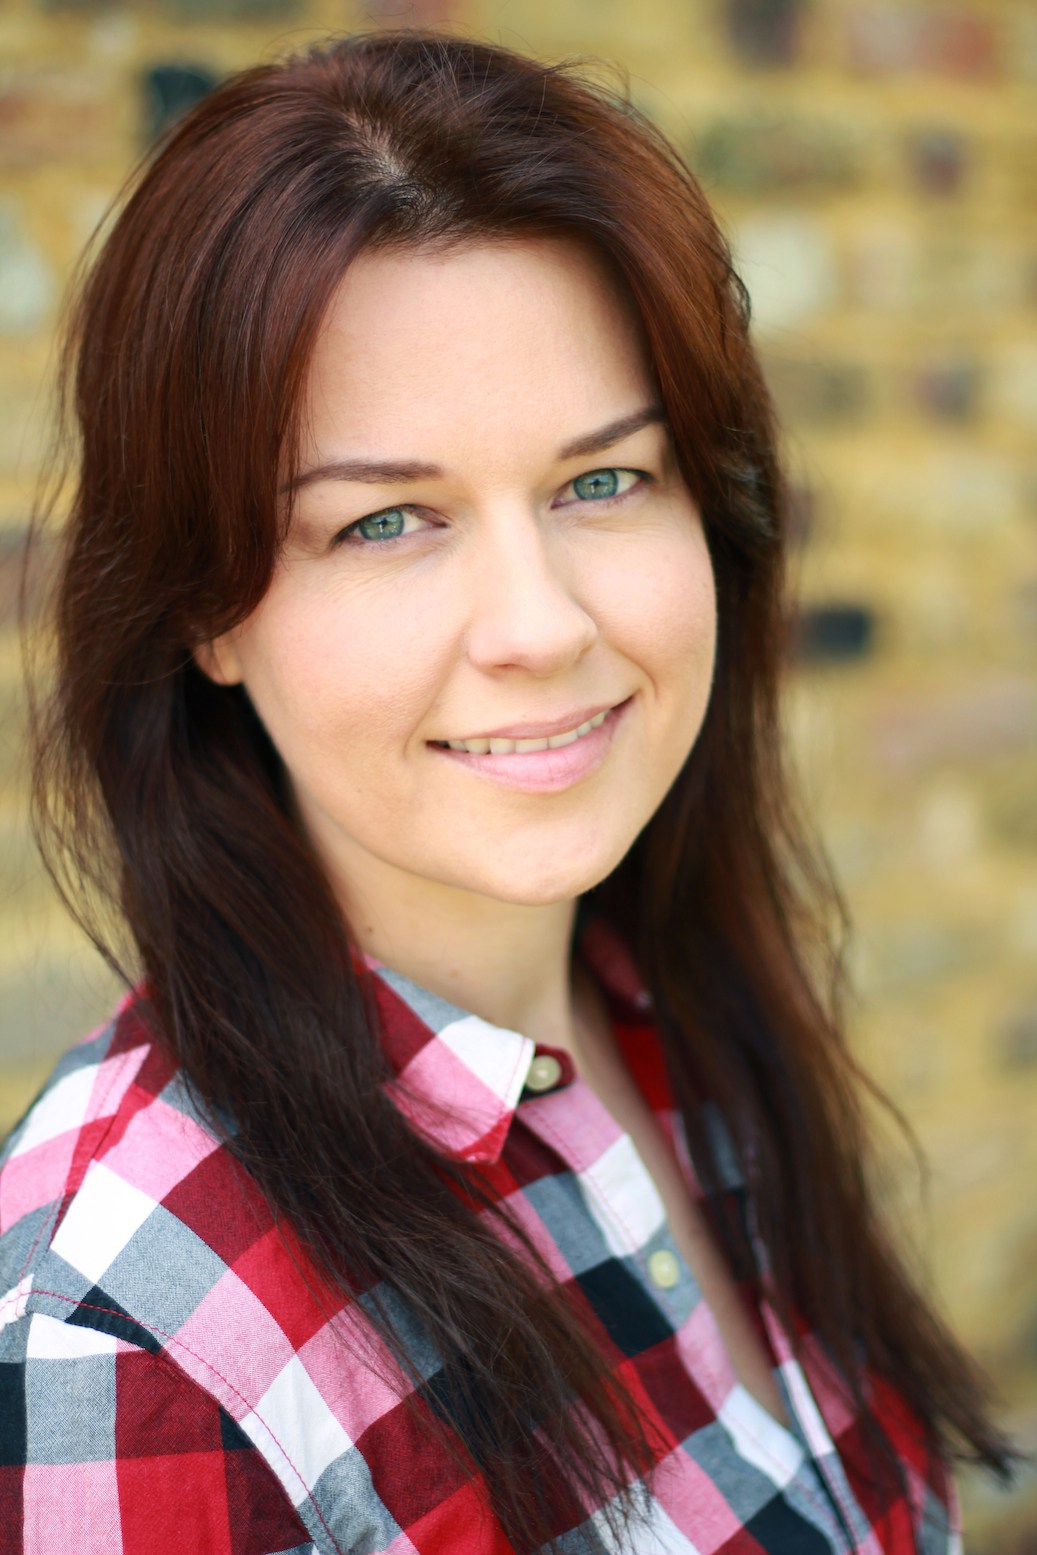 Kate Madison